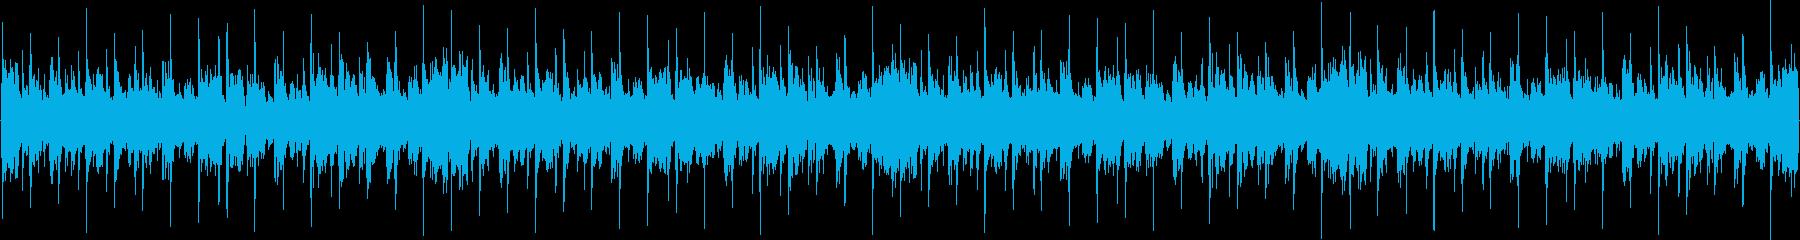 144bpm、G#-min、ギターソロの再生済みの波形